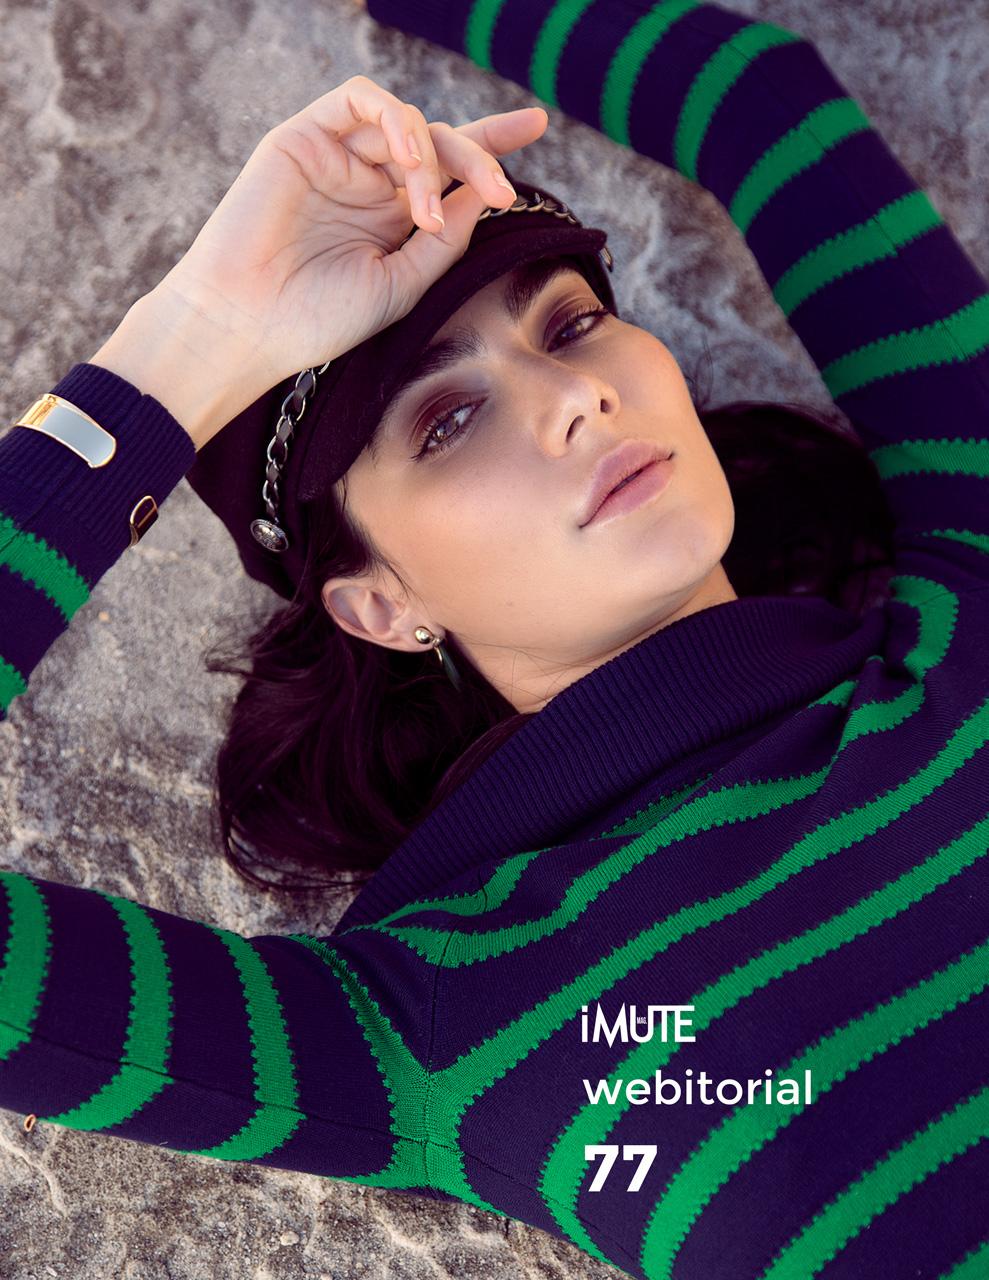 Claudia webitorial for iMute Magazine Photographer | Lucy Kinnen Model | Claudia Herro @ Chadwick Models Stylist | Czarina Argel Makeup & Hair | Claudia Spirou